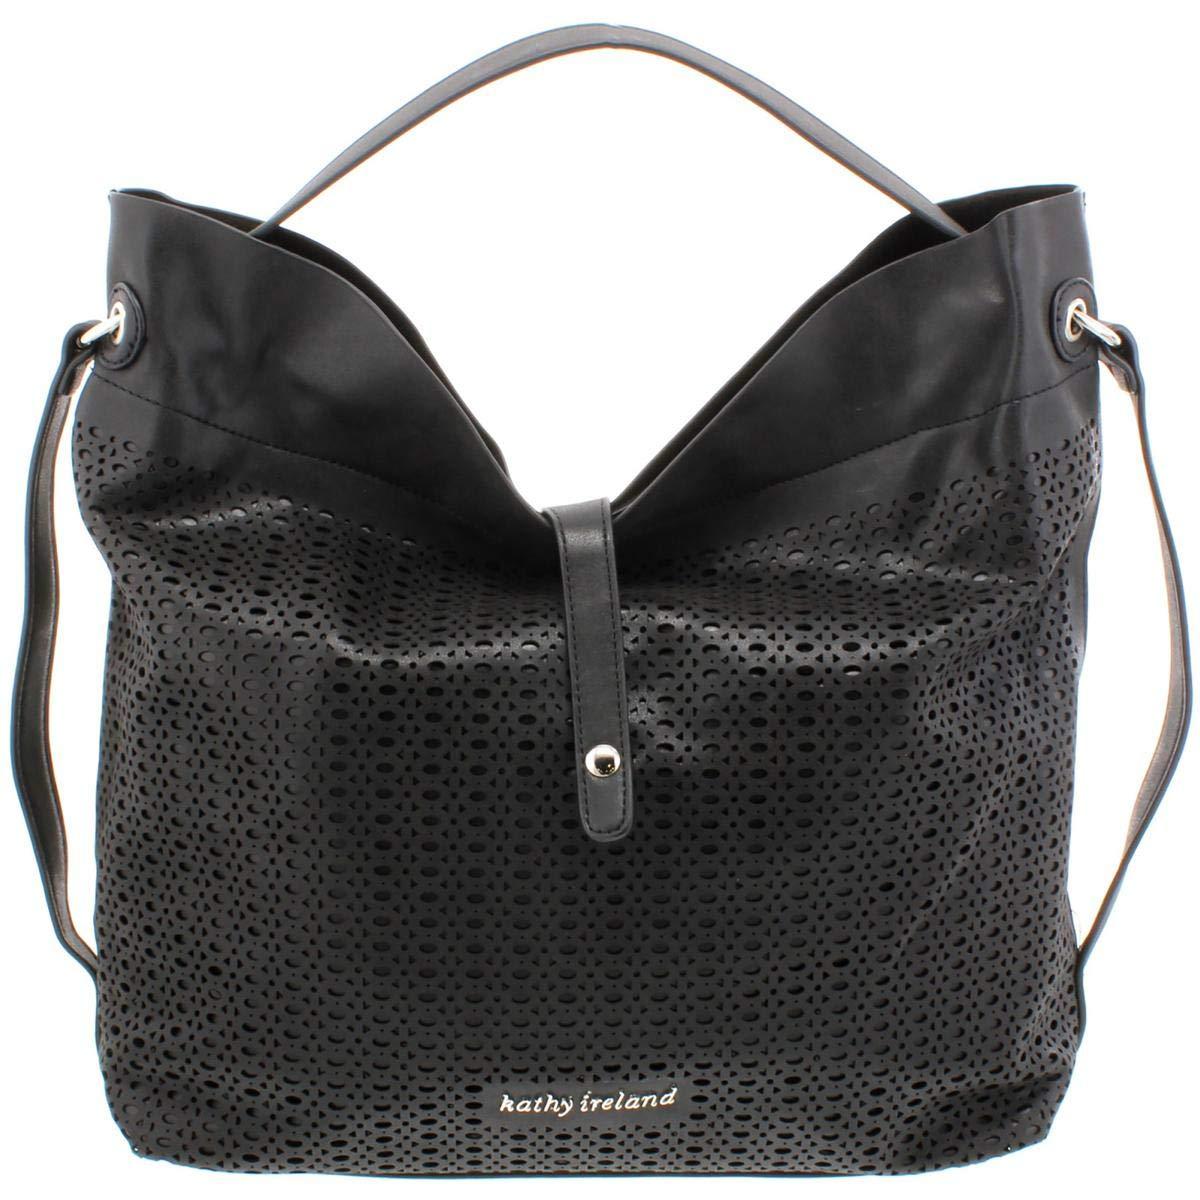 Kathy Ireland Womens Faux Leather Laser Cut Hobo Handbag Black Large